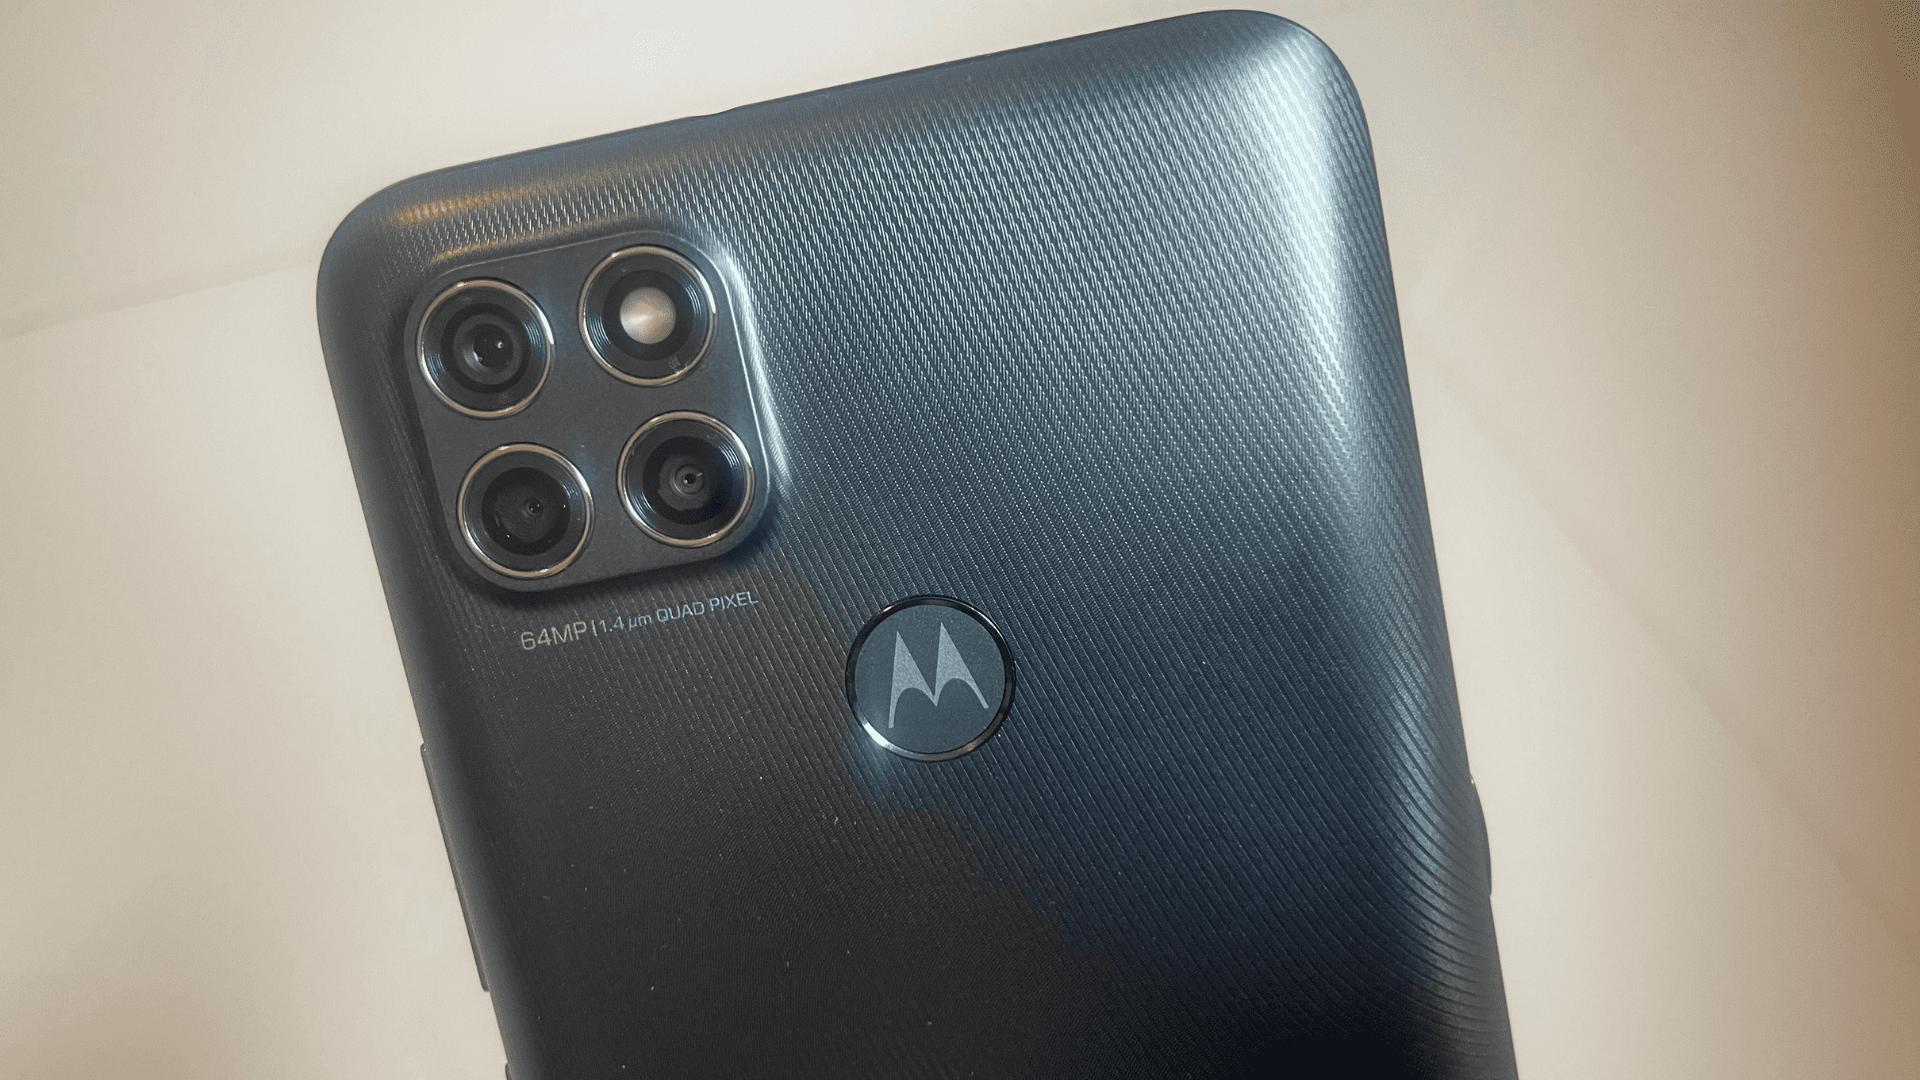 Moto G9 Power: celular Motorola tem conjunto triplo de câmeras (Foto: Gabriel Fricke / Zoom)